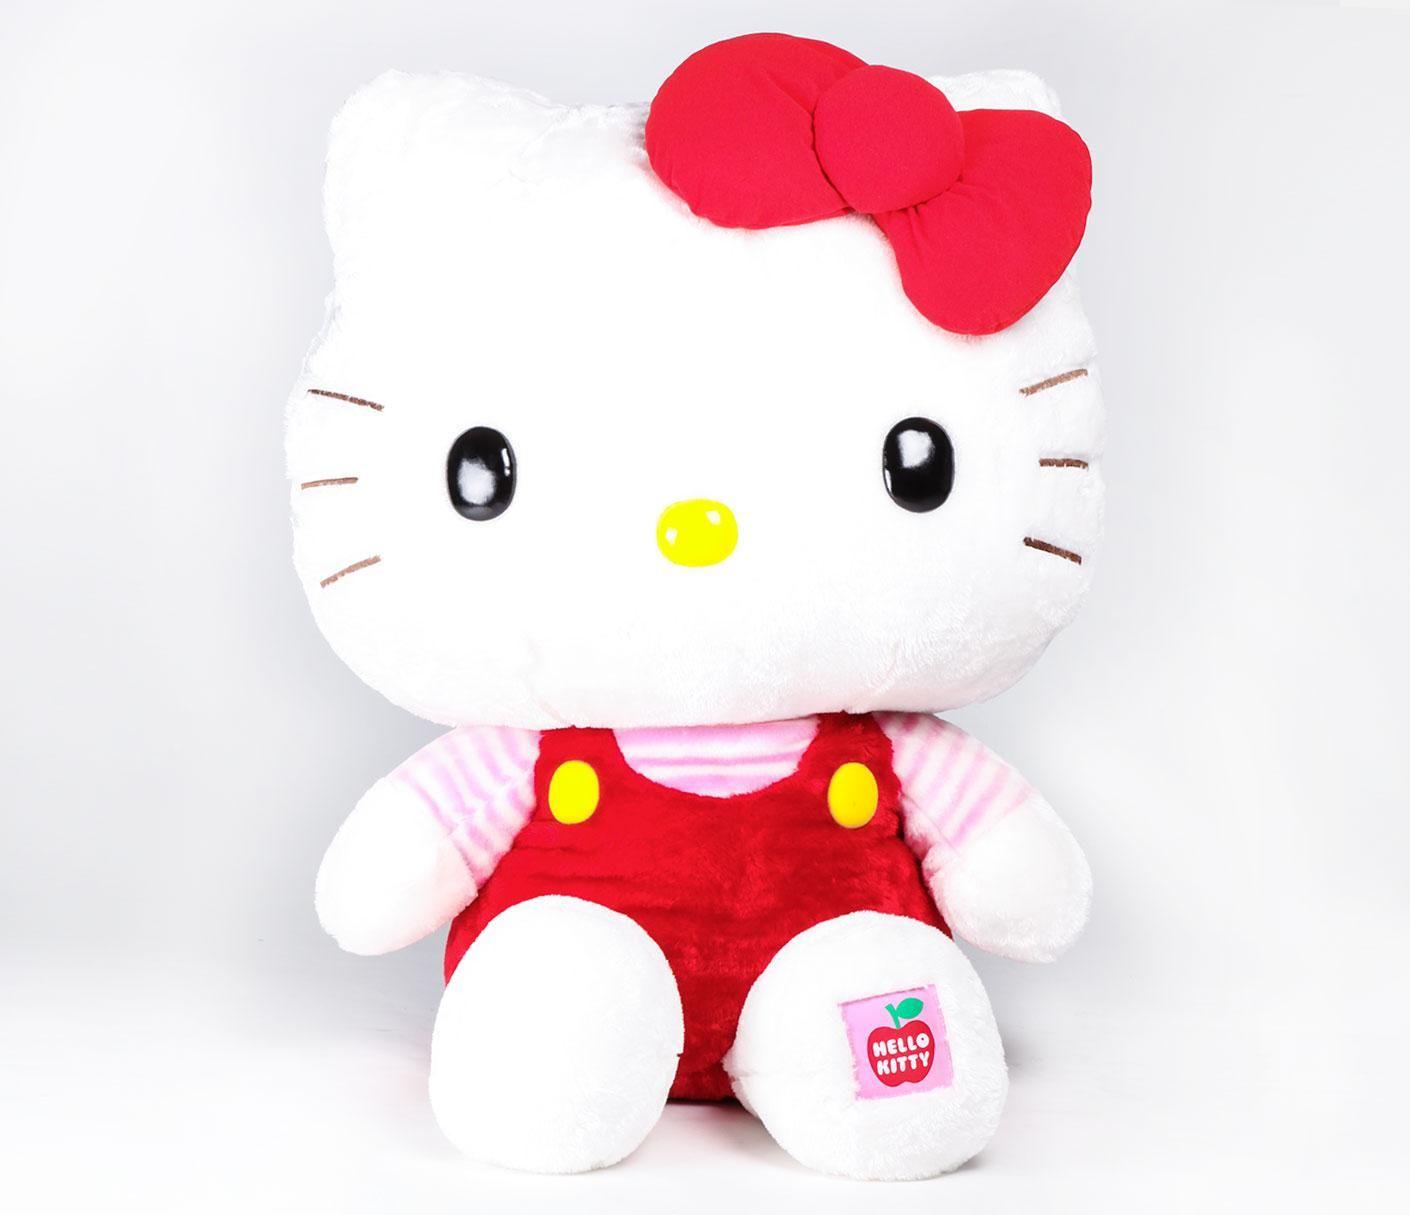 Hello Kitty 37 Giant Plush Red Overalls 249 00 Hello Kitty Items Hello Kitty Plush Hello Kitty